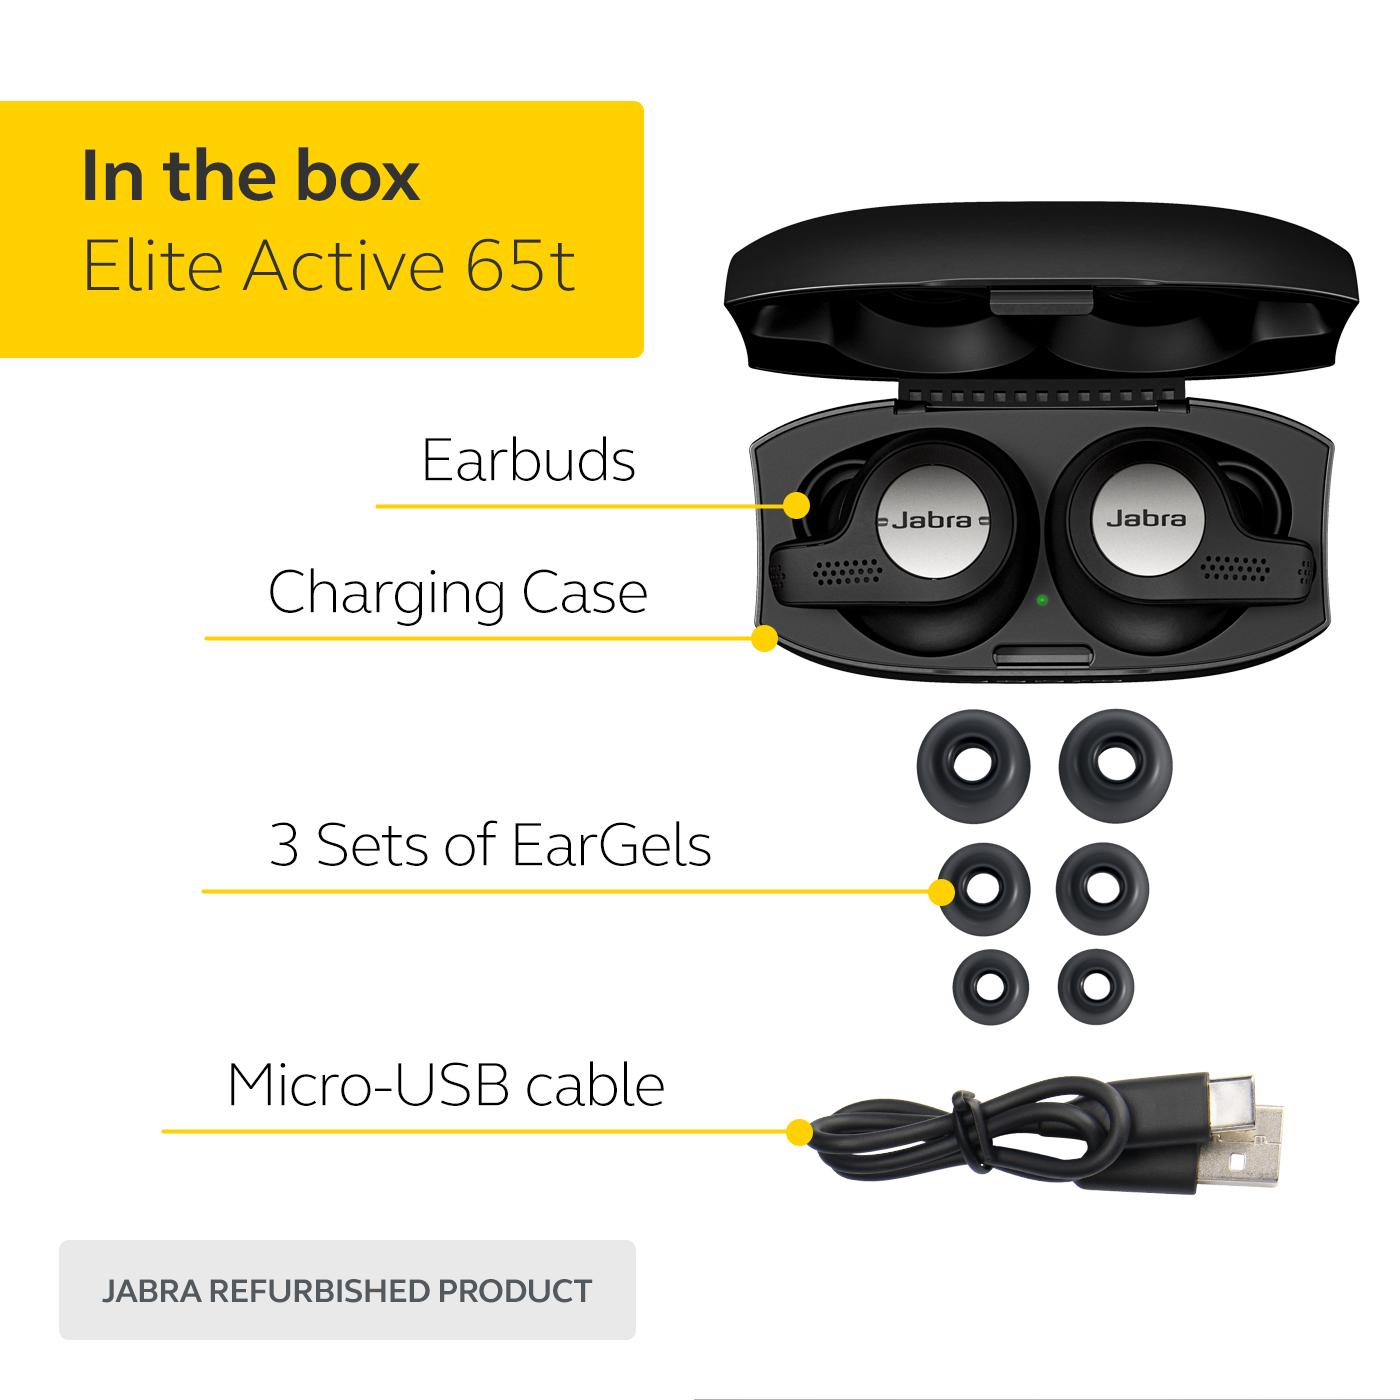 thumbnail 12 - Jabra Elite Active 65t True Wireless Earbuds (Certified Refurbished)